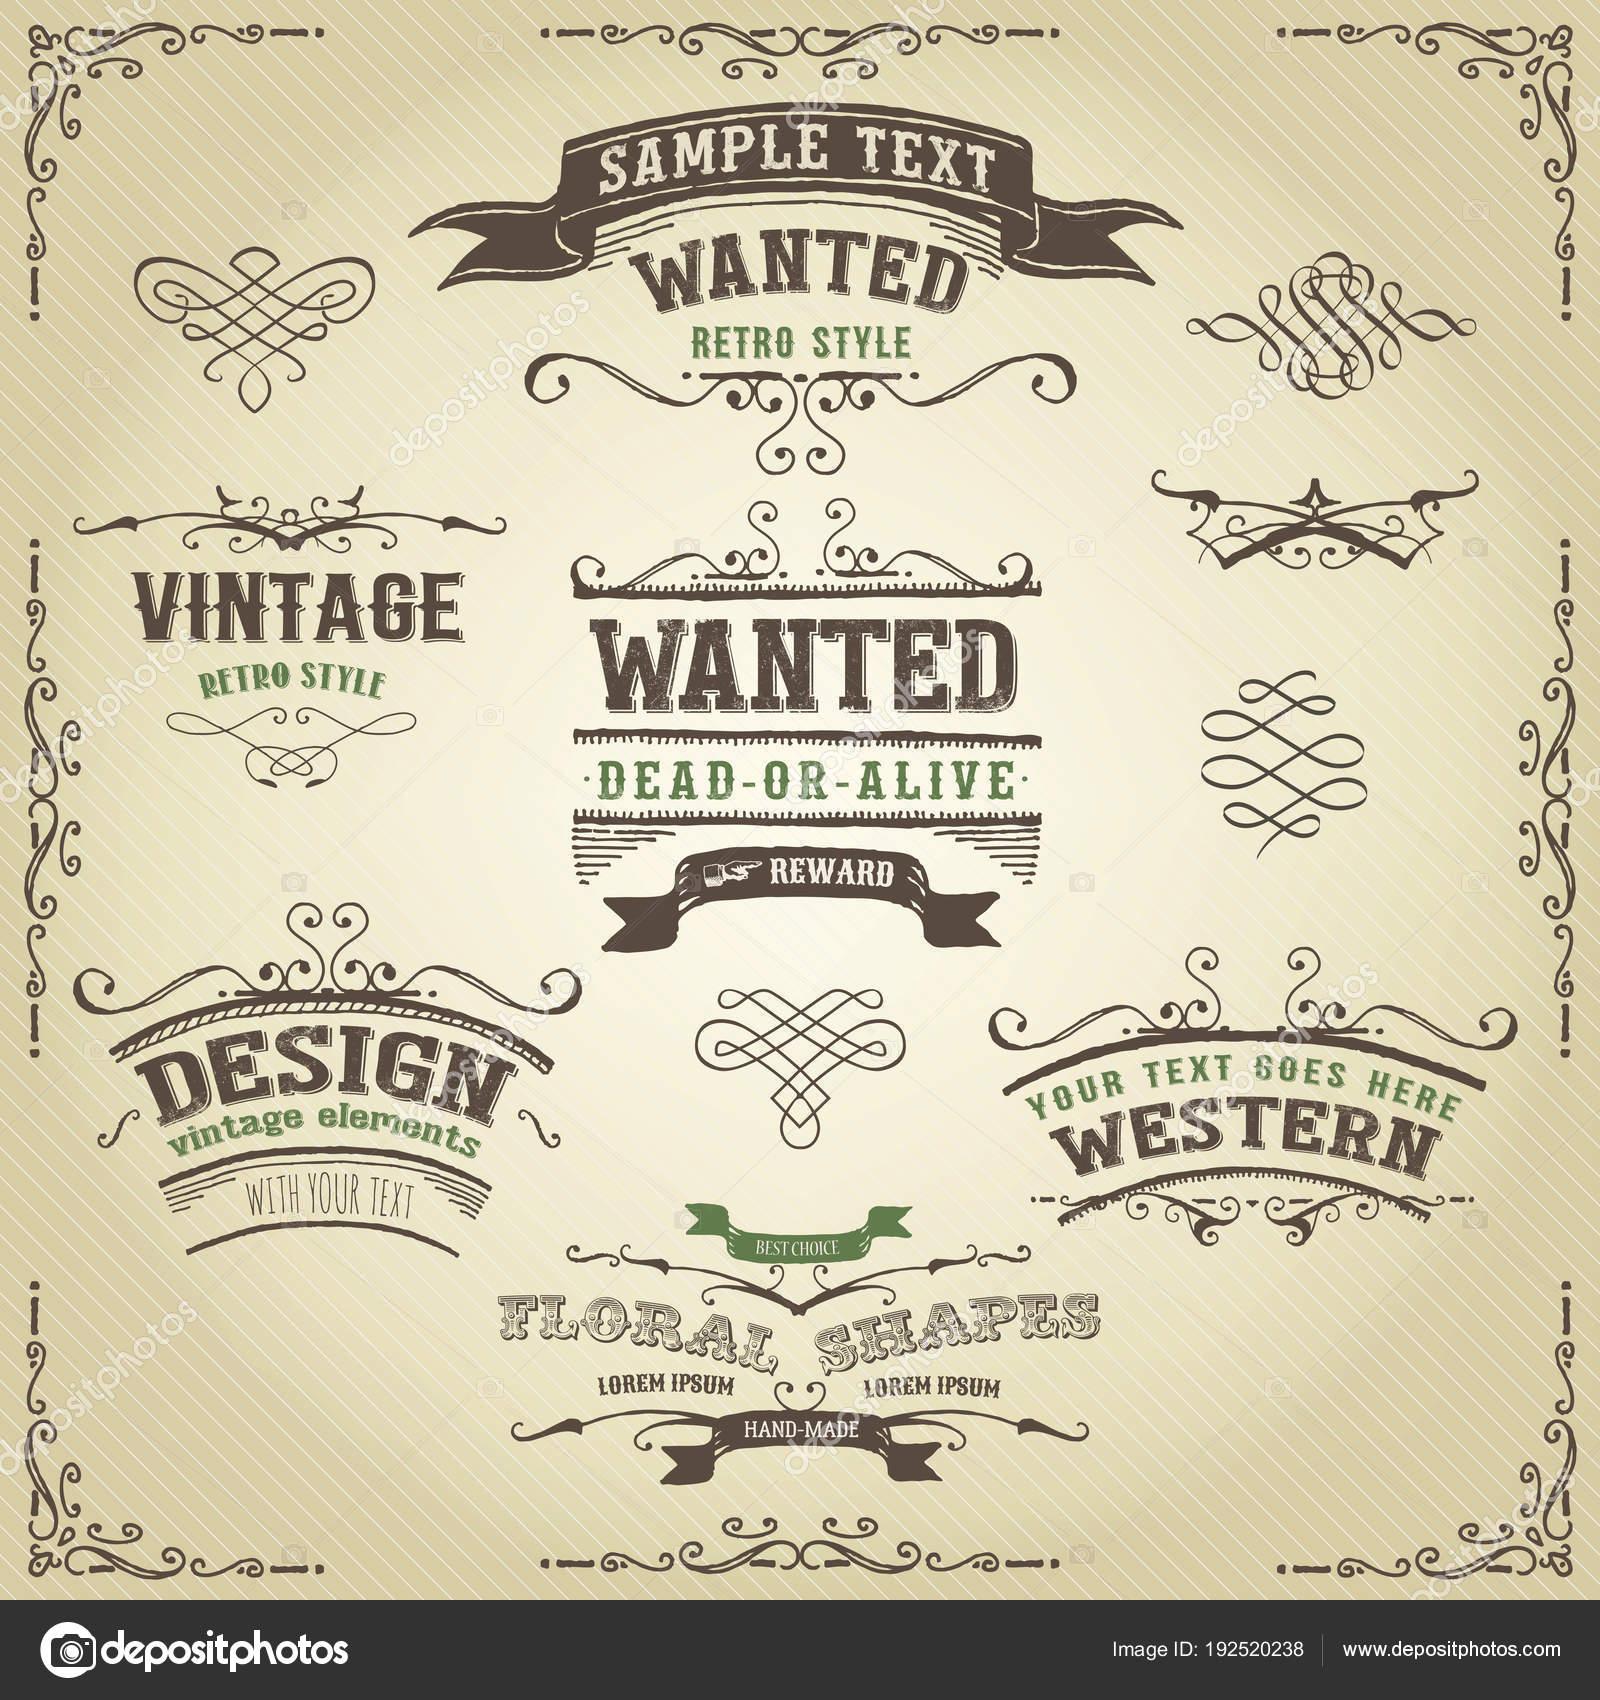 Vintage Alte Wollte Plakat Plakat Vorlage — Stockvektor © benchyb ...